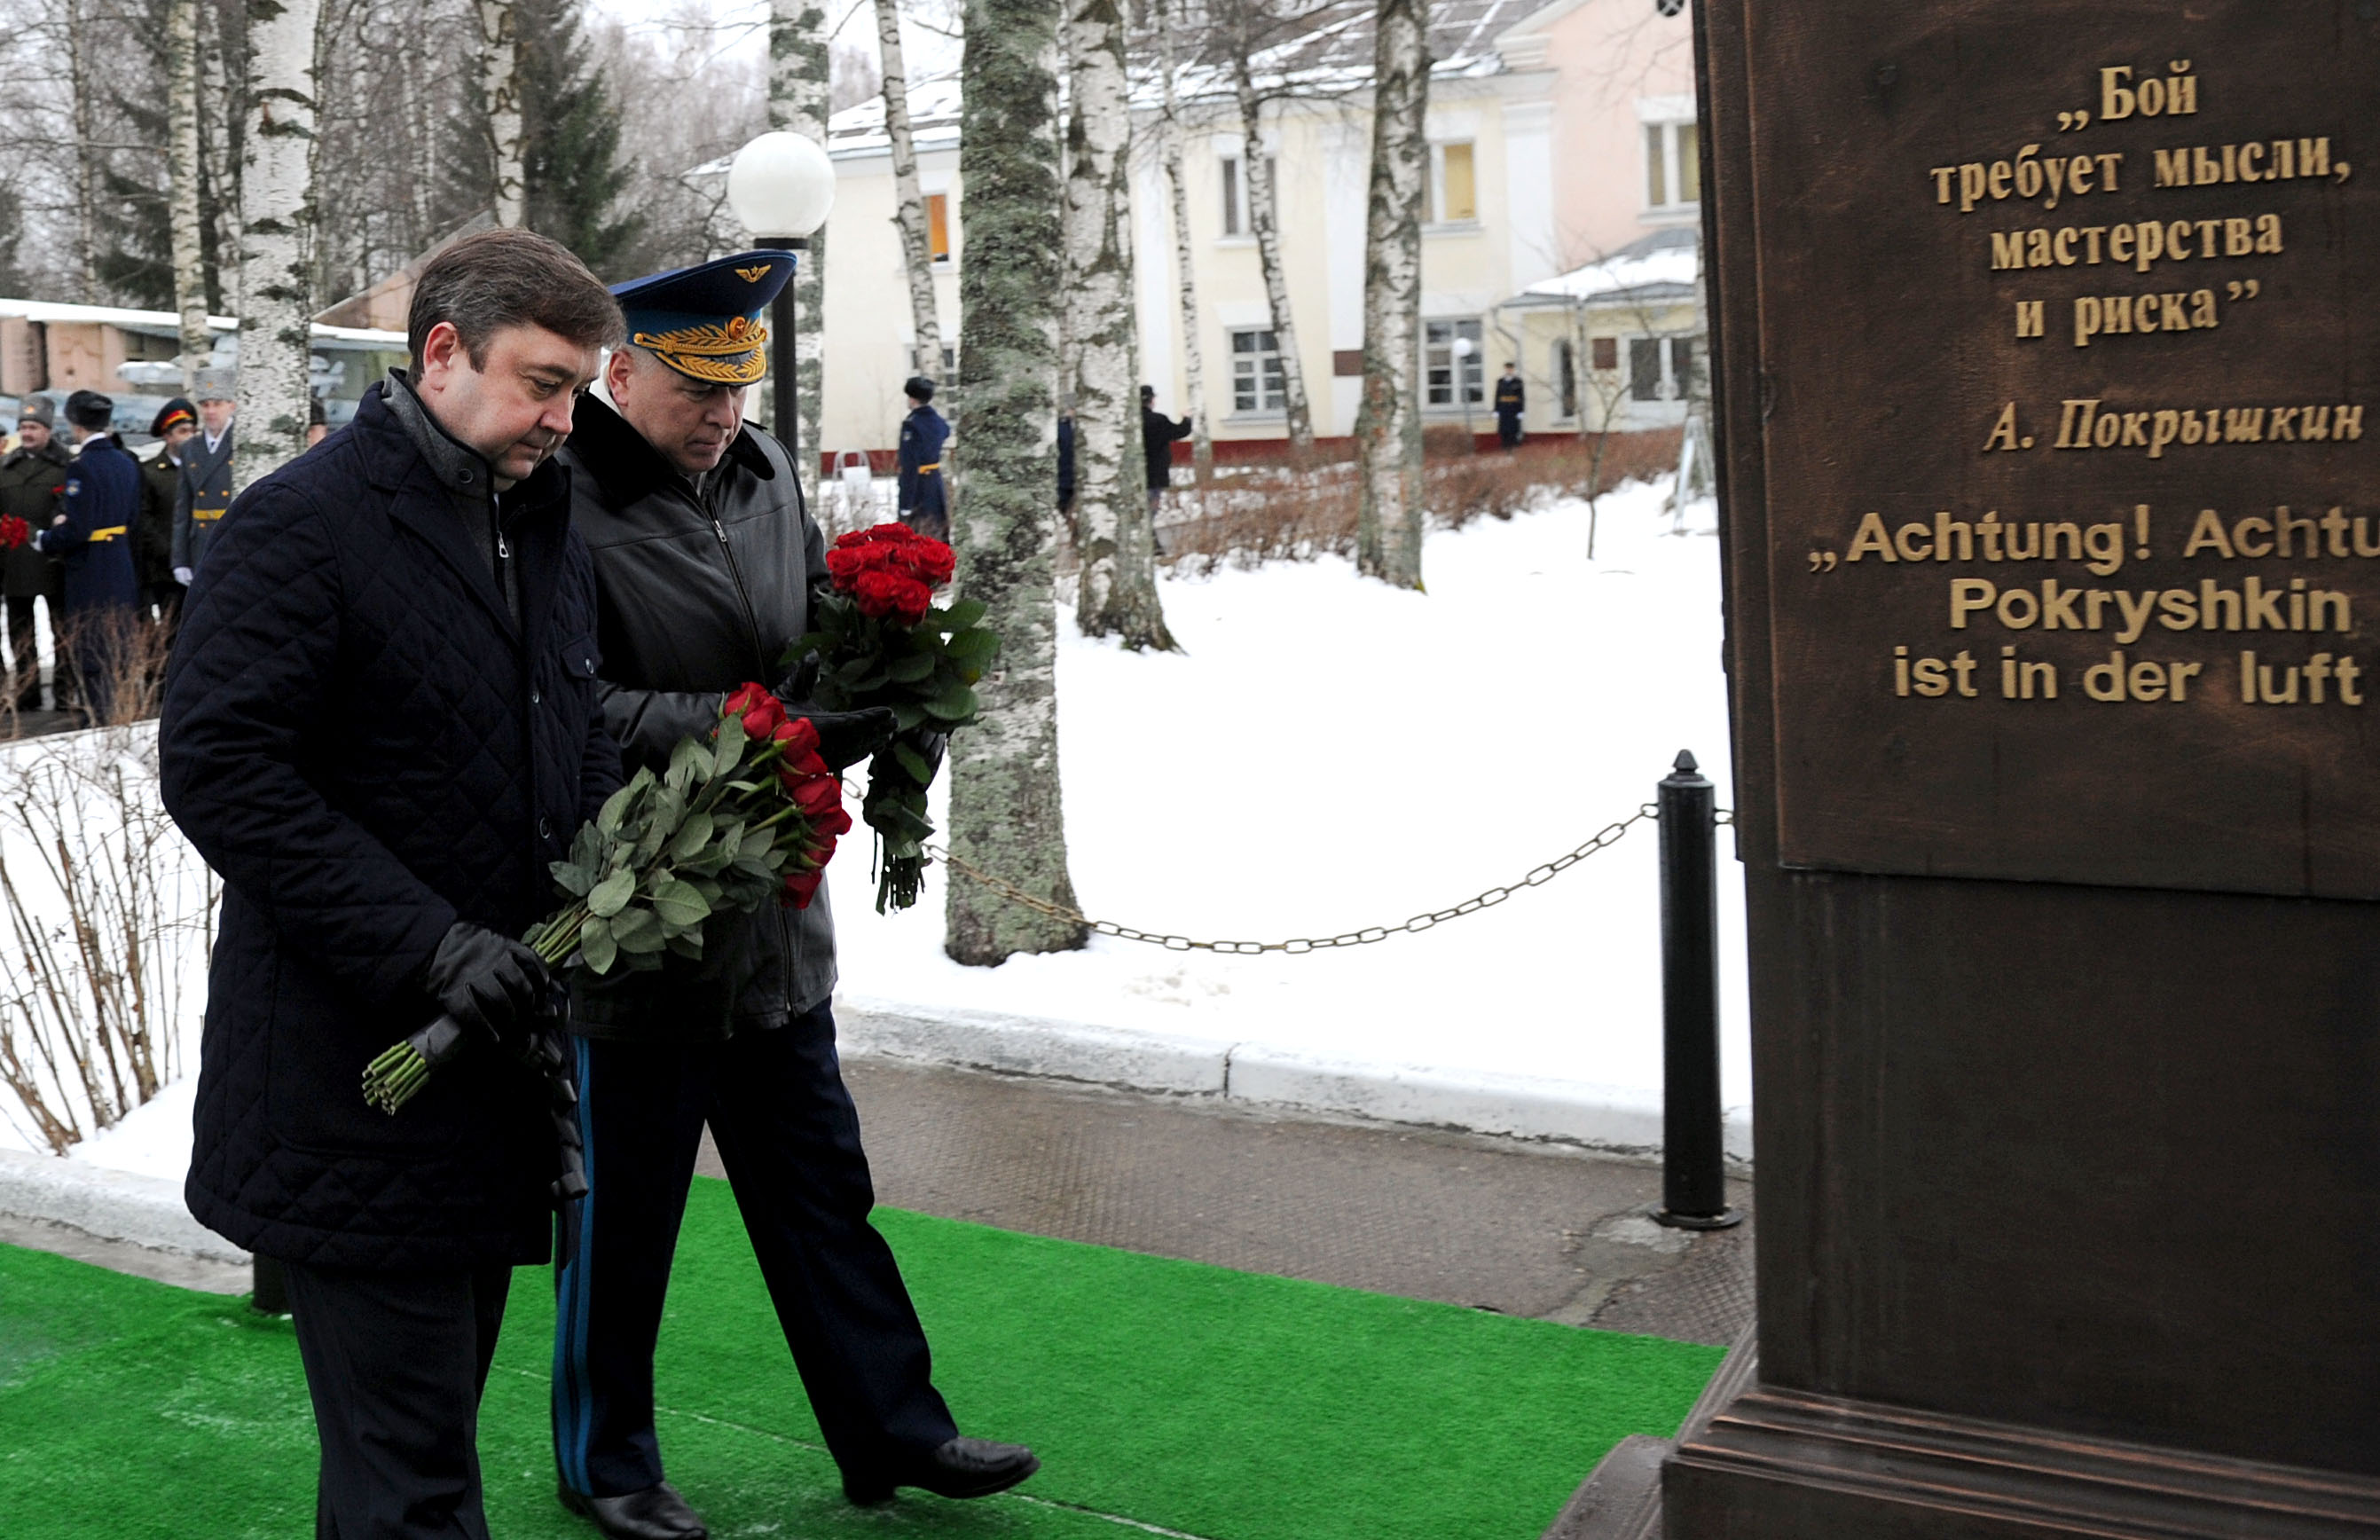 Ржев, памятник А.И. Покрышкину